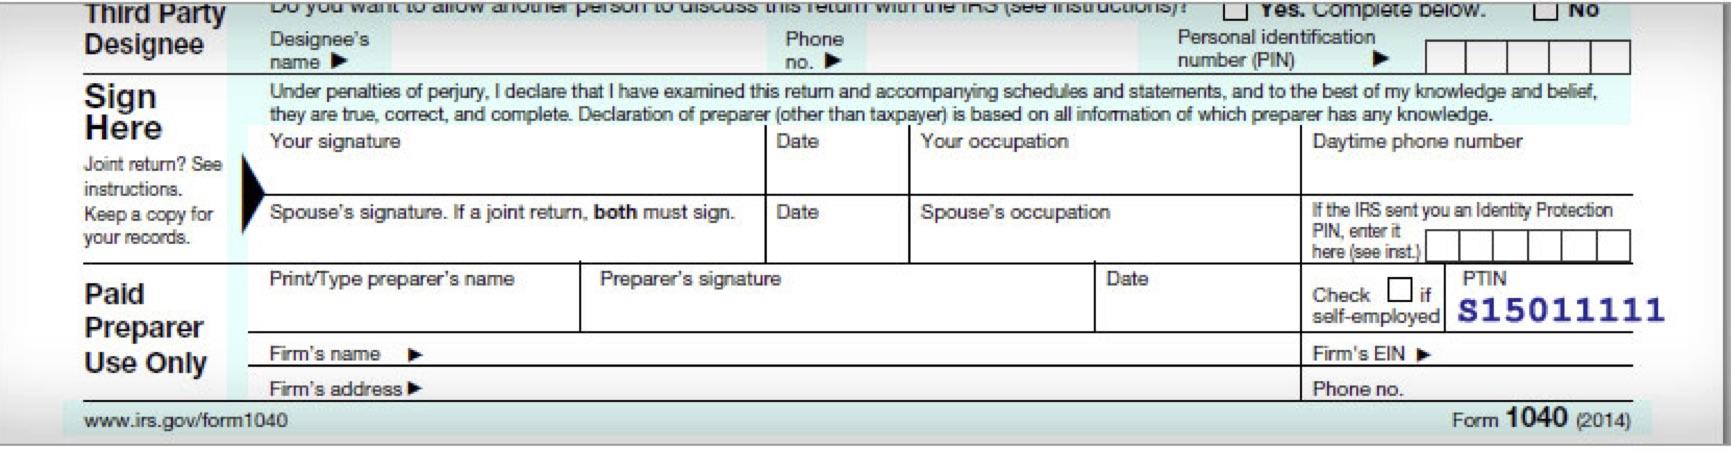 Irs Federal Long Form 1040 Signature Line Election 2016 No Way Trump